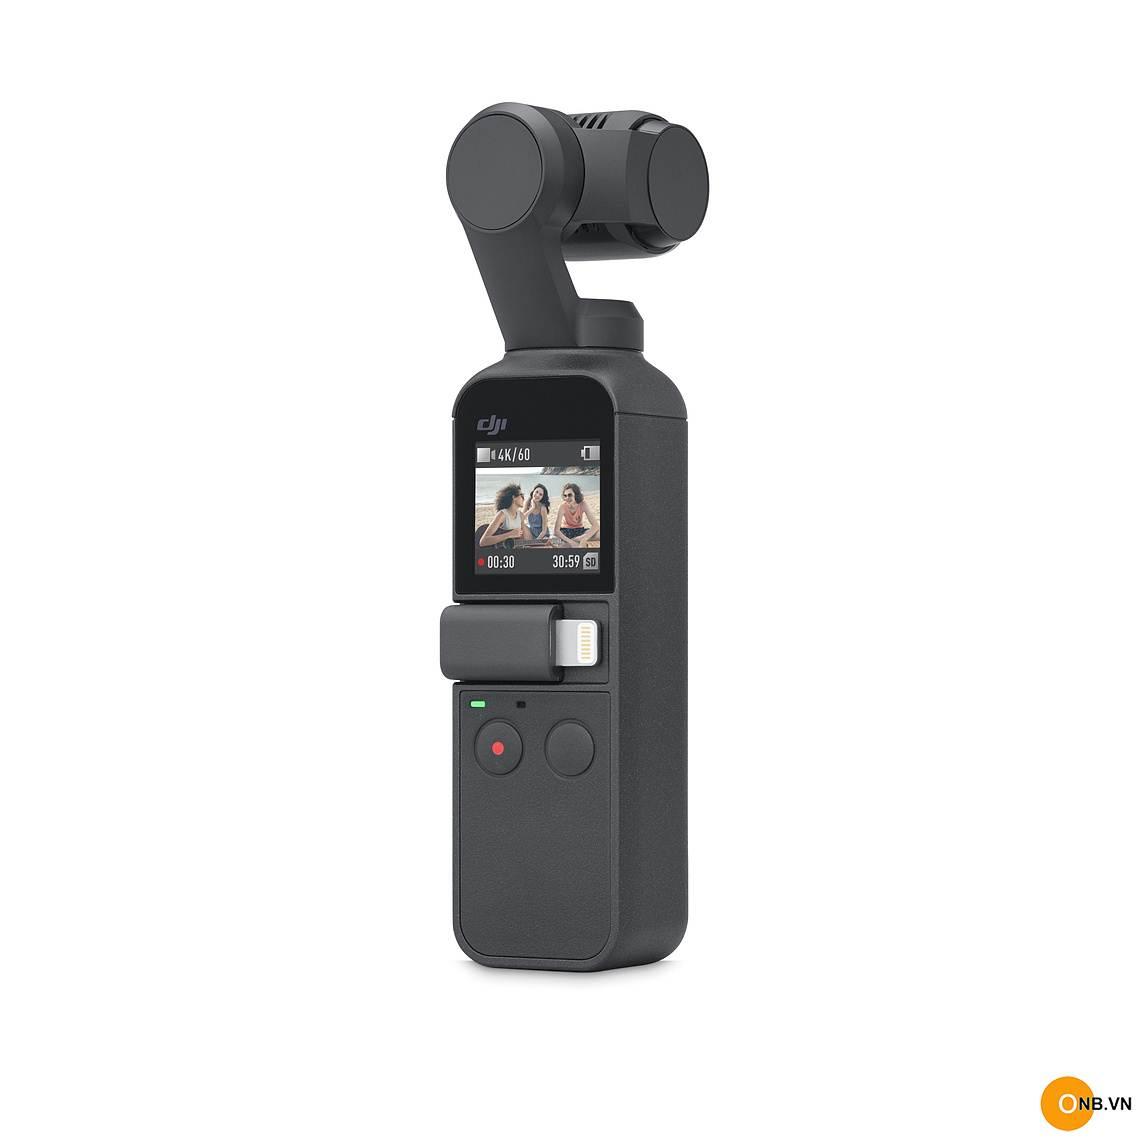 Osmo Pocket Camera quay phim 4k nhỏ gọn